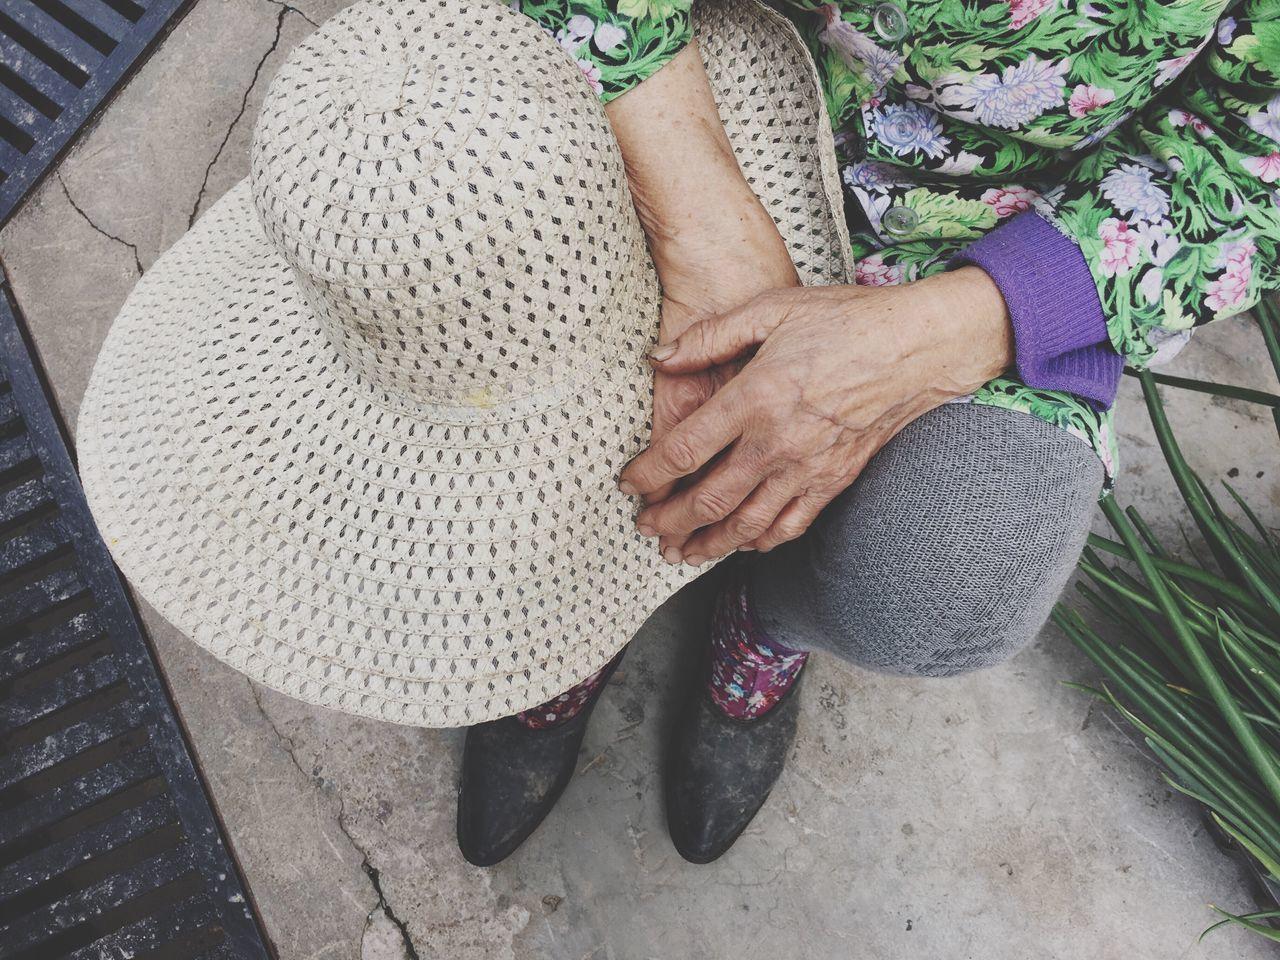 Grandmother/Work/Fatigue